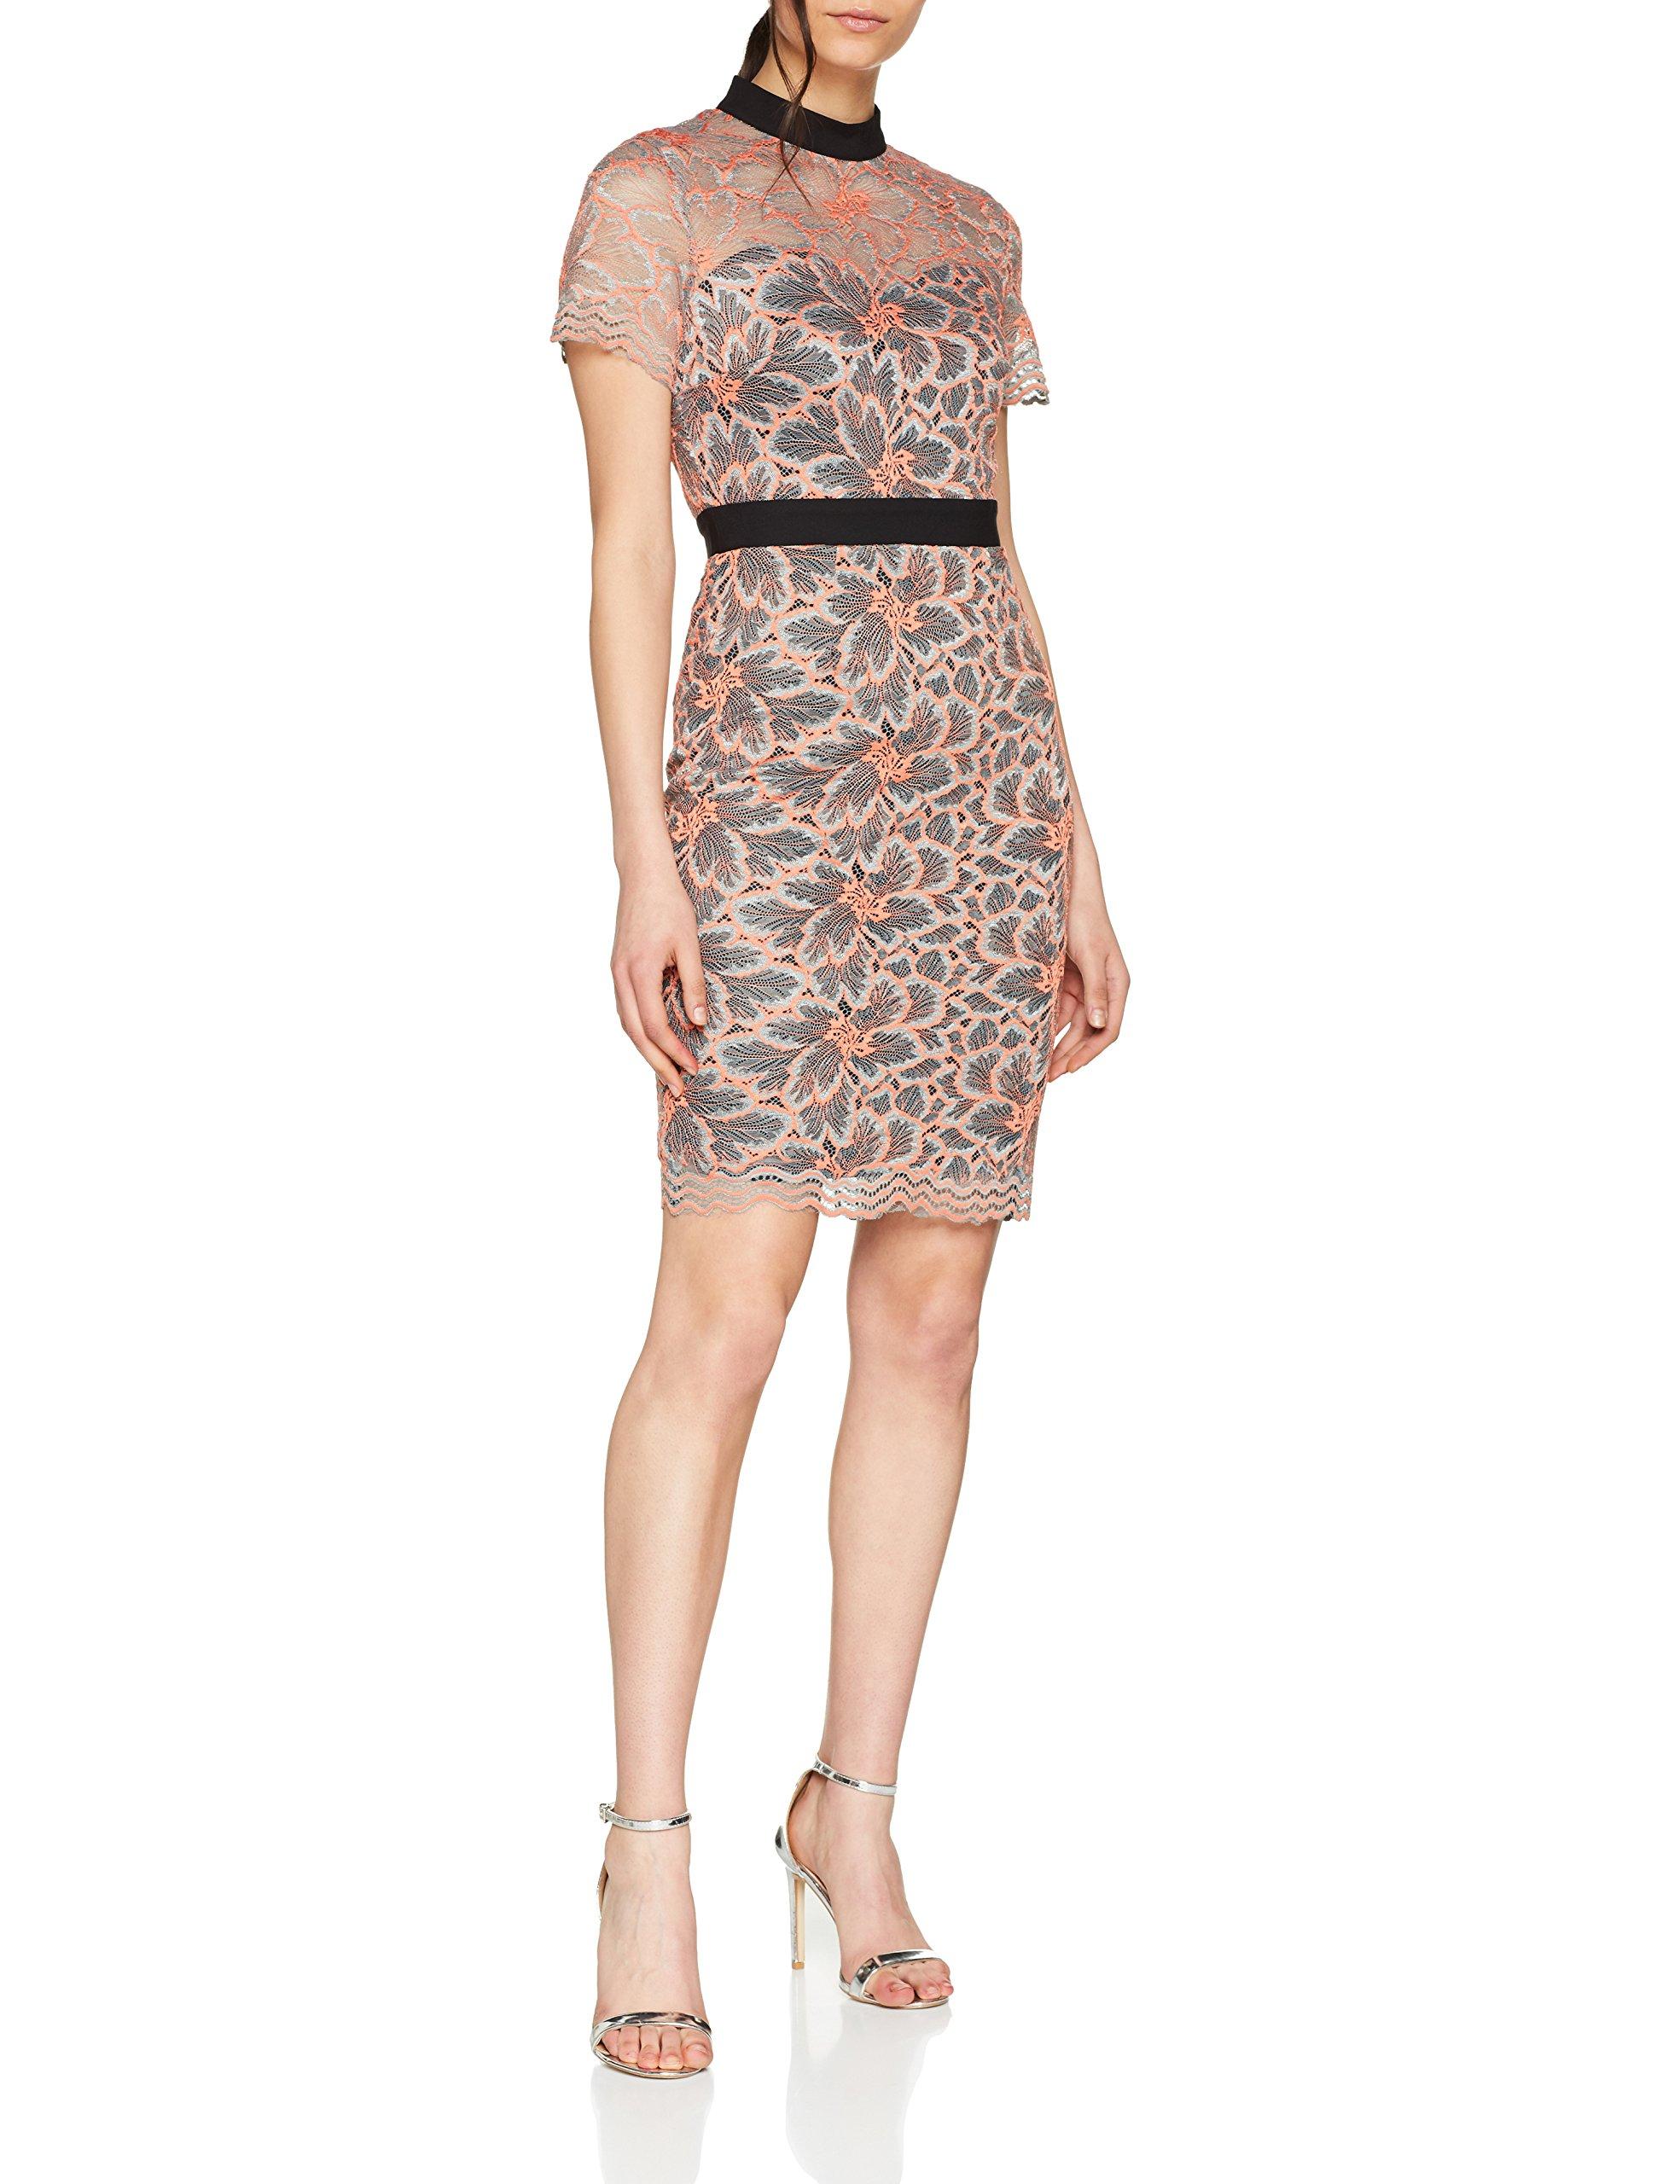 Femme Soft Multi Lace RobeMulticolore 00140 Dress High Neck Paper Dolls RjL5A43